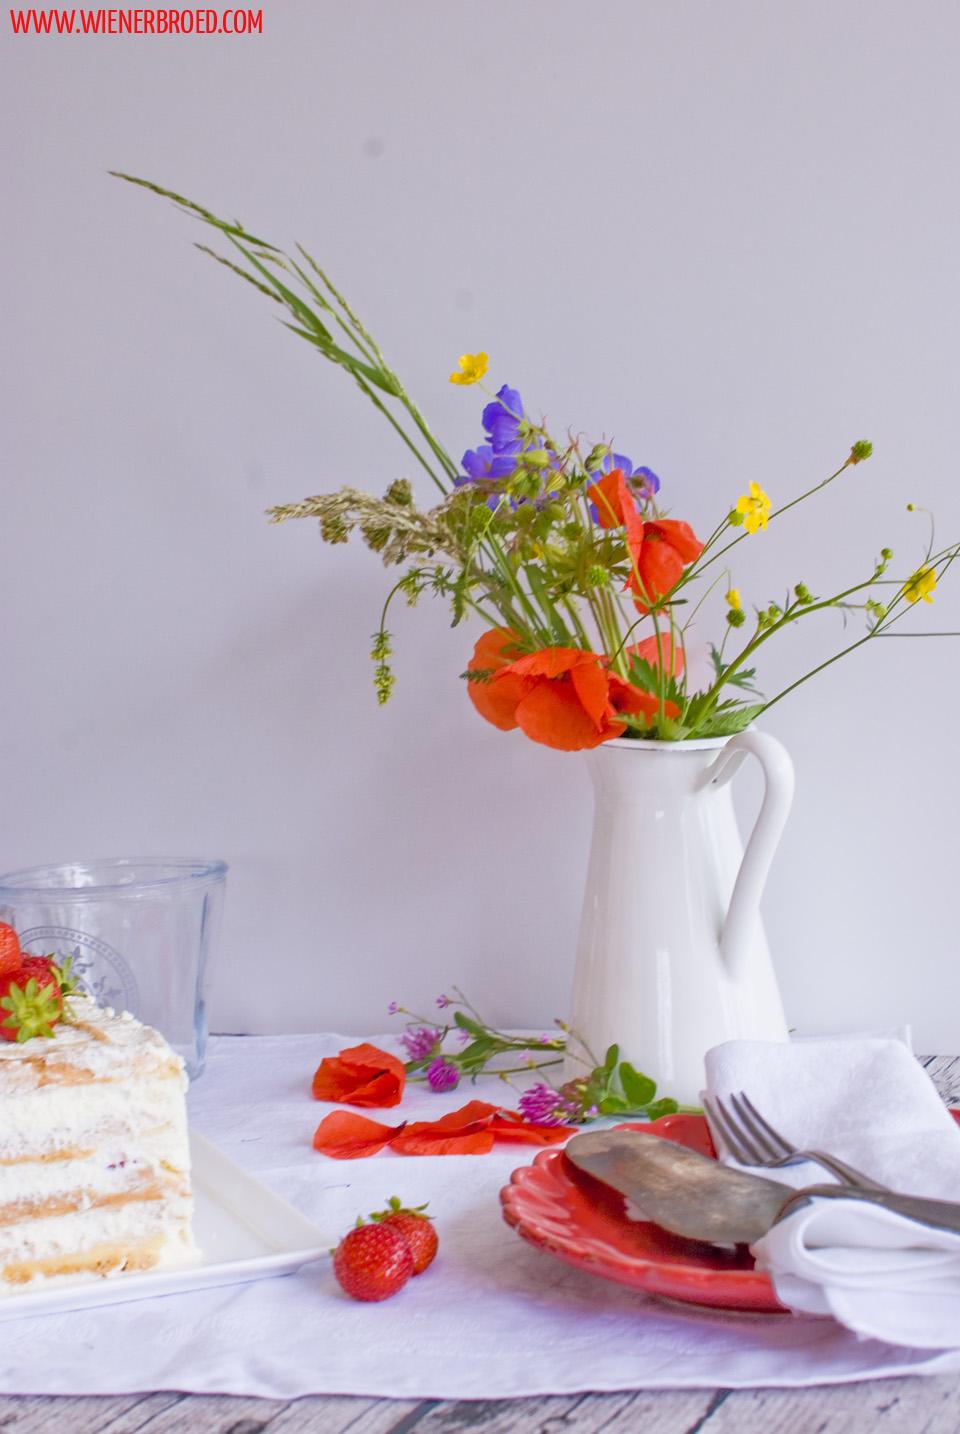 Midsommar Jordgubbstårta | Erdbeer-Biskuitwaffel-Torte / Strawberry sponge cake waffle [wienerbroed.com]